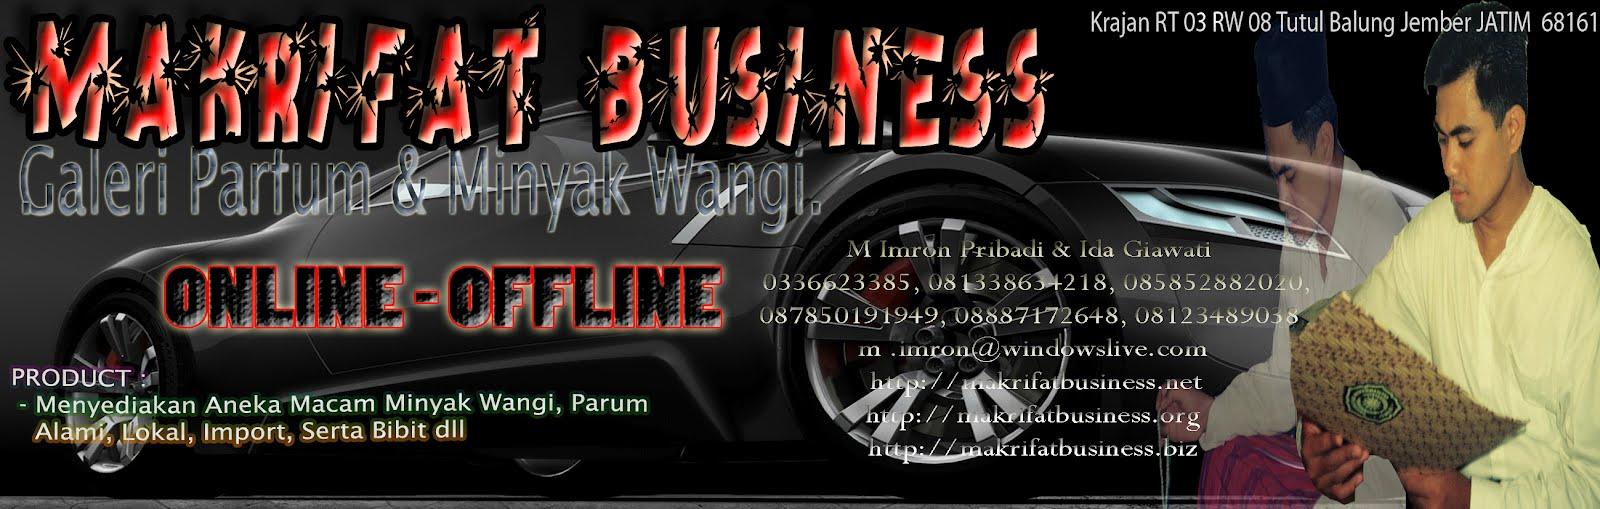 MAKRIFAT BUSINESS - Galeri MINYAK WANGI - PARFUM desa TUTUL Balung Jember - INDONESIA